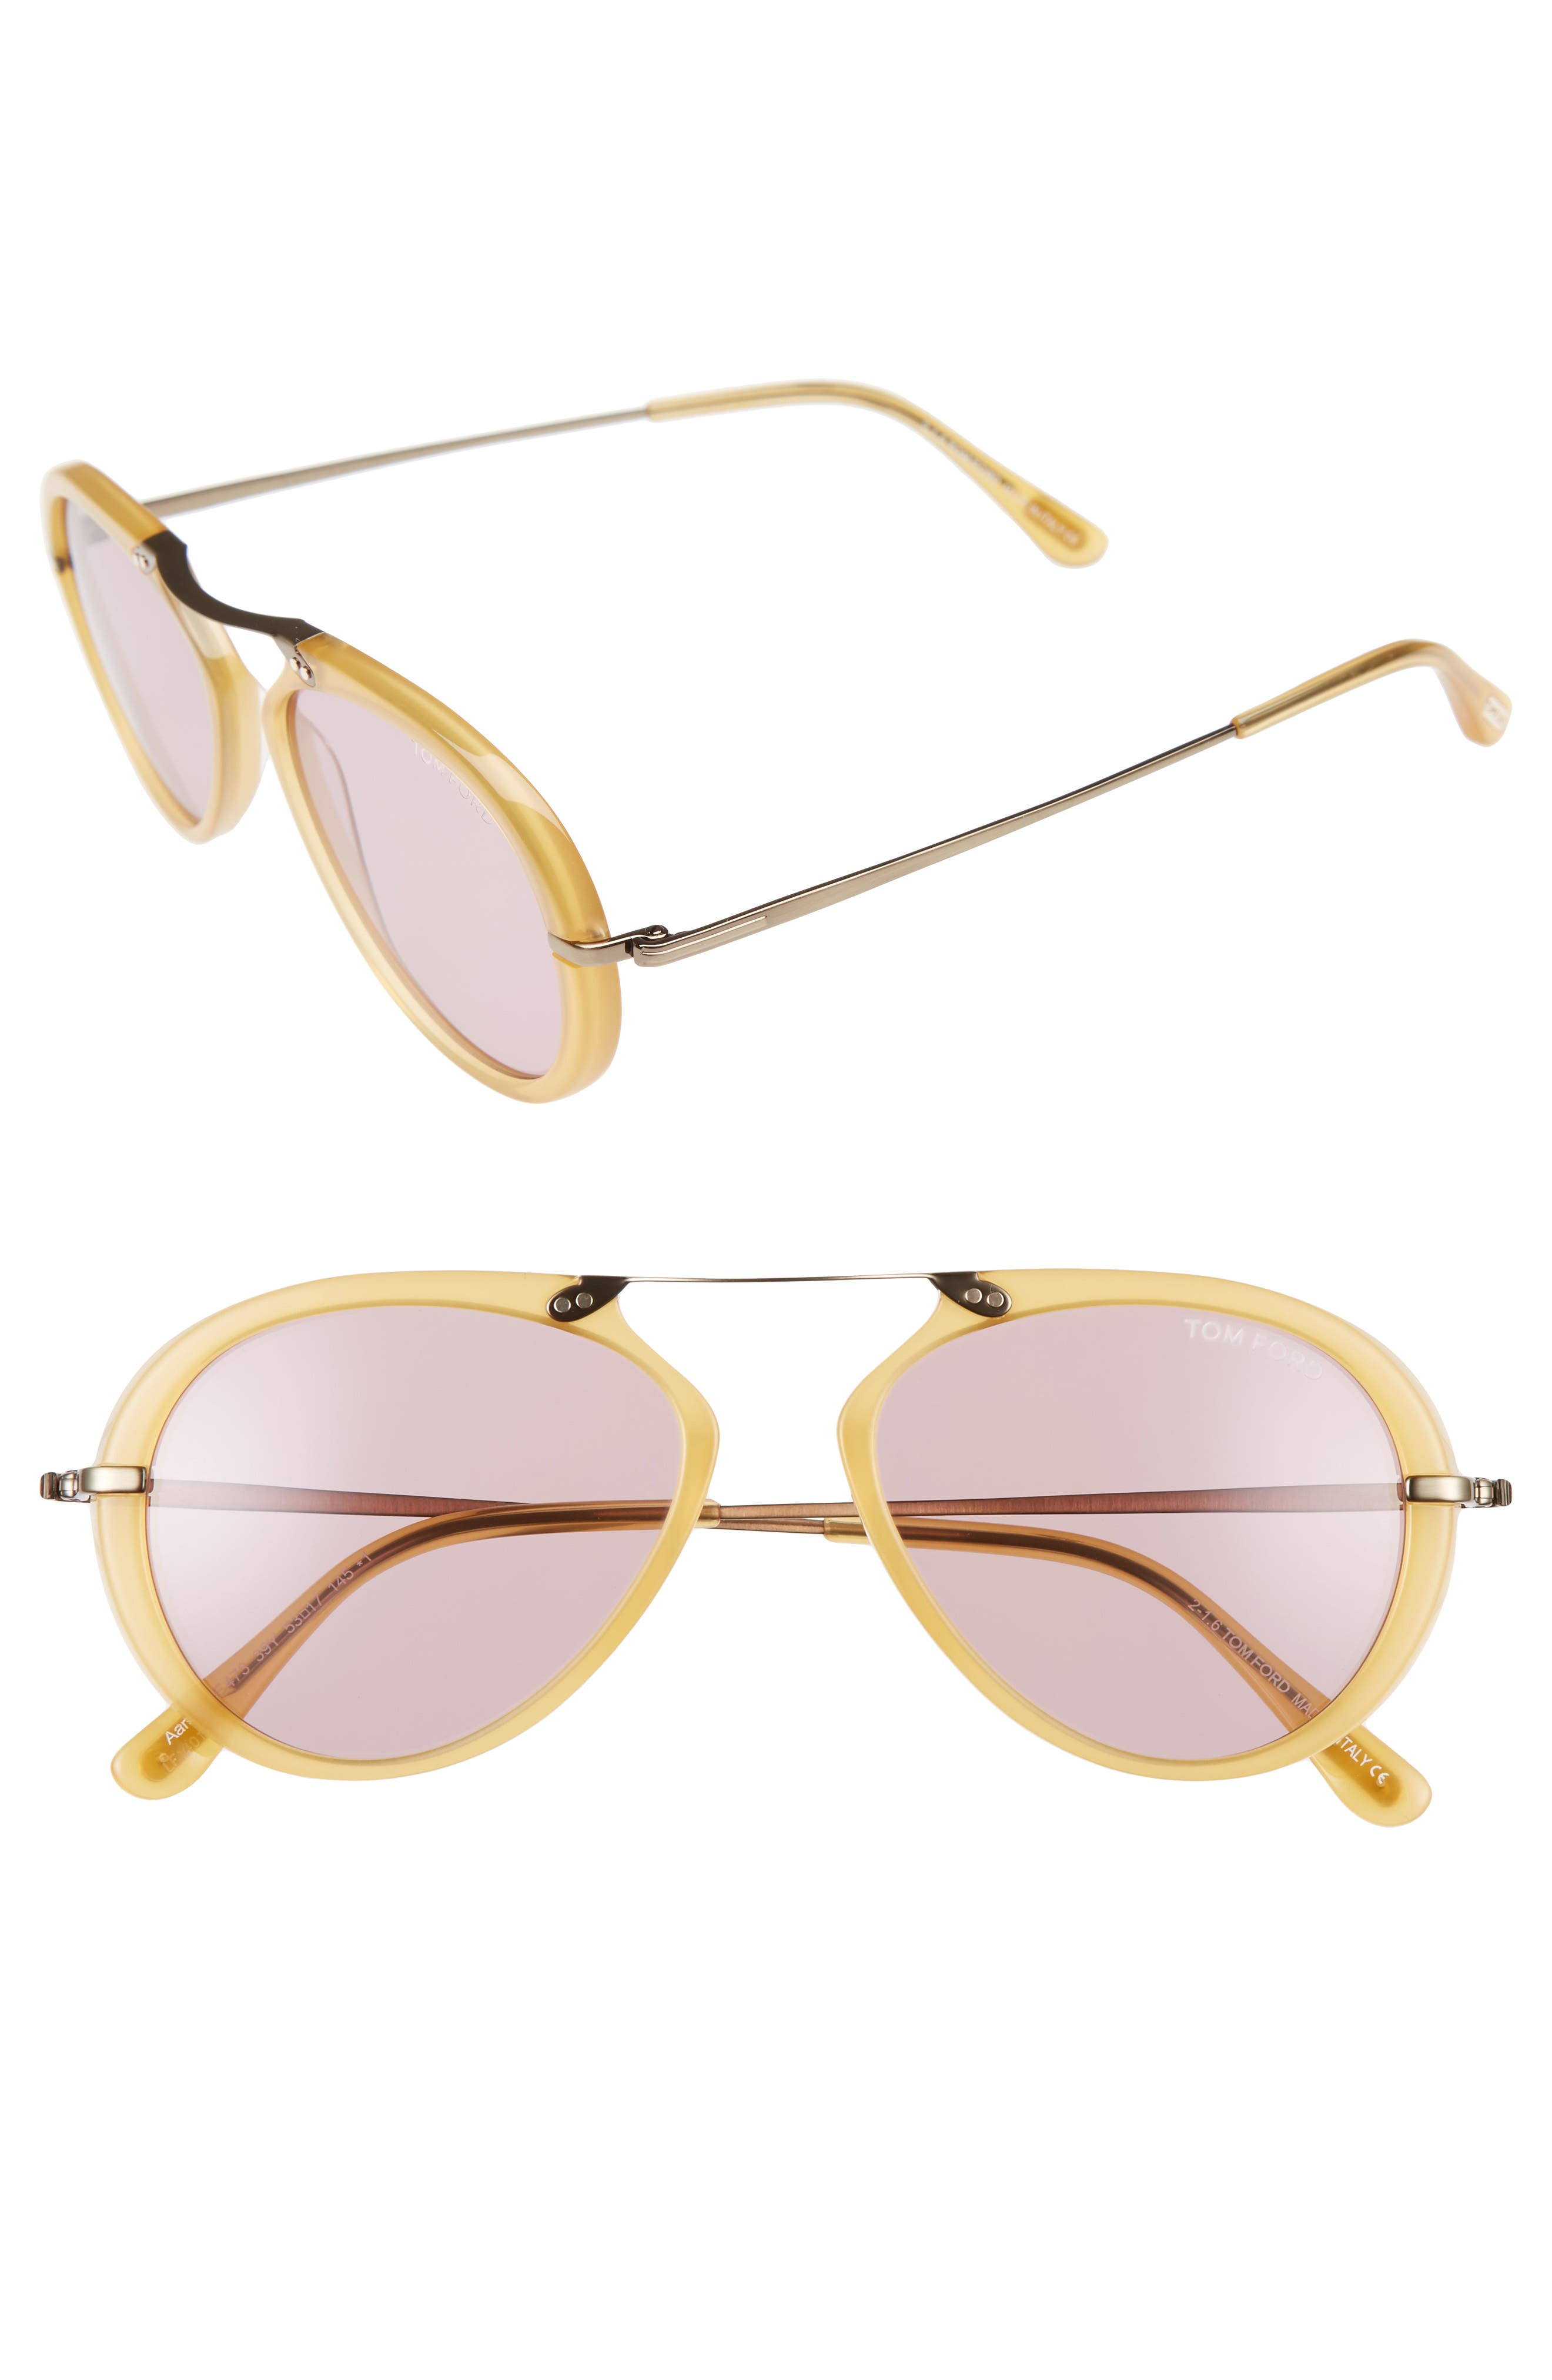 Tom Ford 'Aaron' 53mm Sunglasses